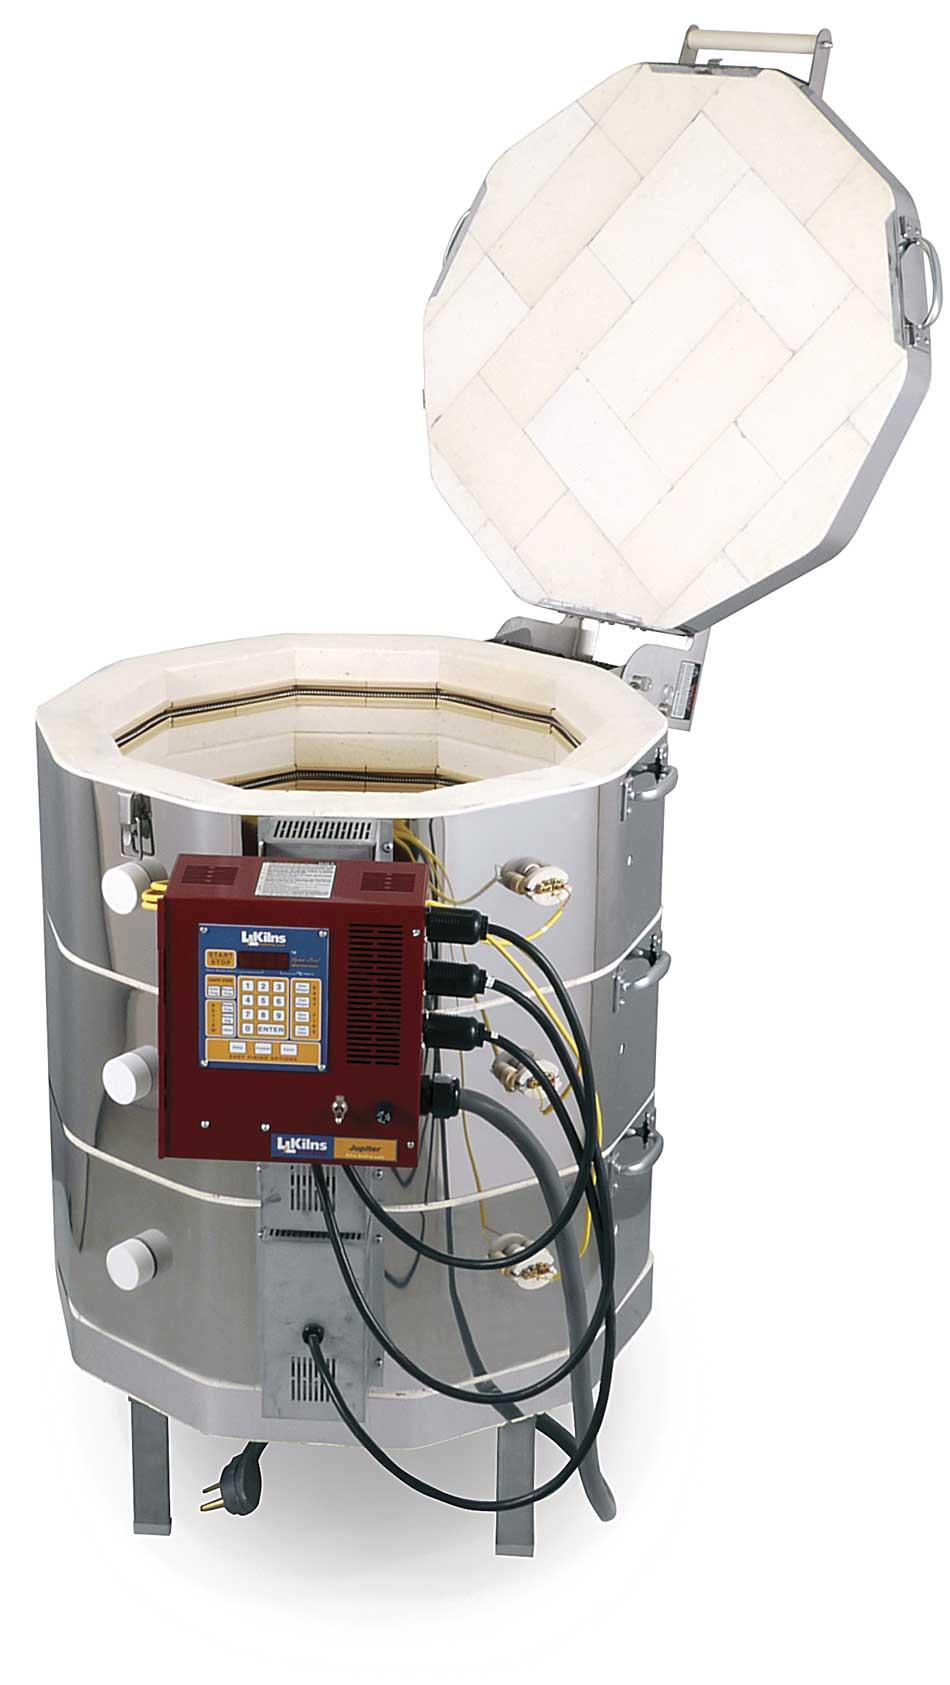 Jupiter Automatic Customizable Kilns Ll Electric Built To Kiln Relay Jd230 Open